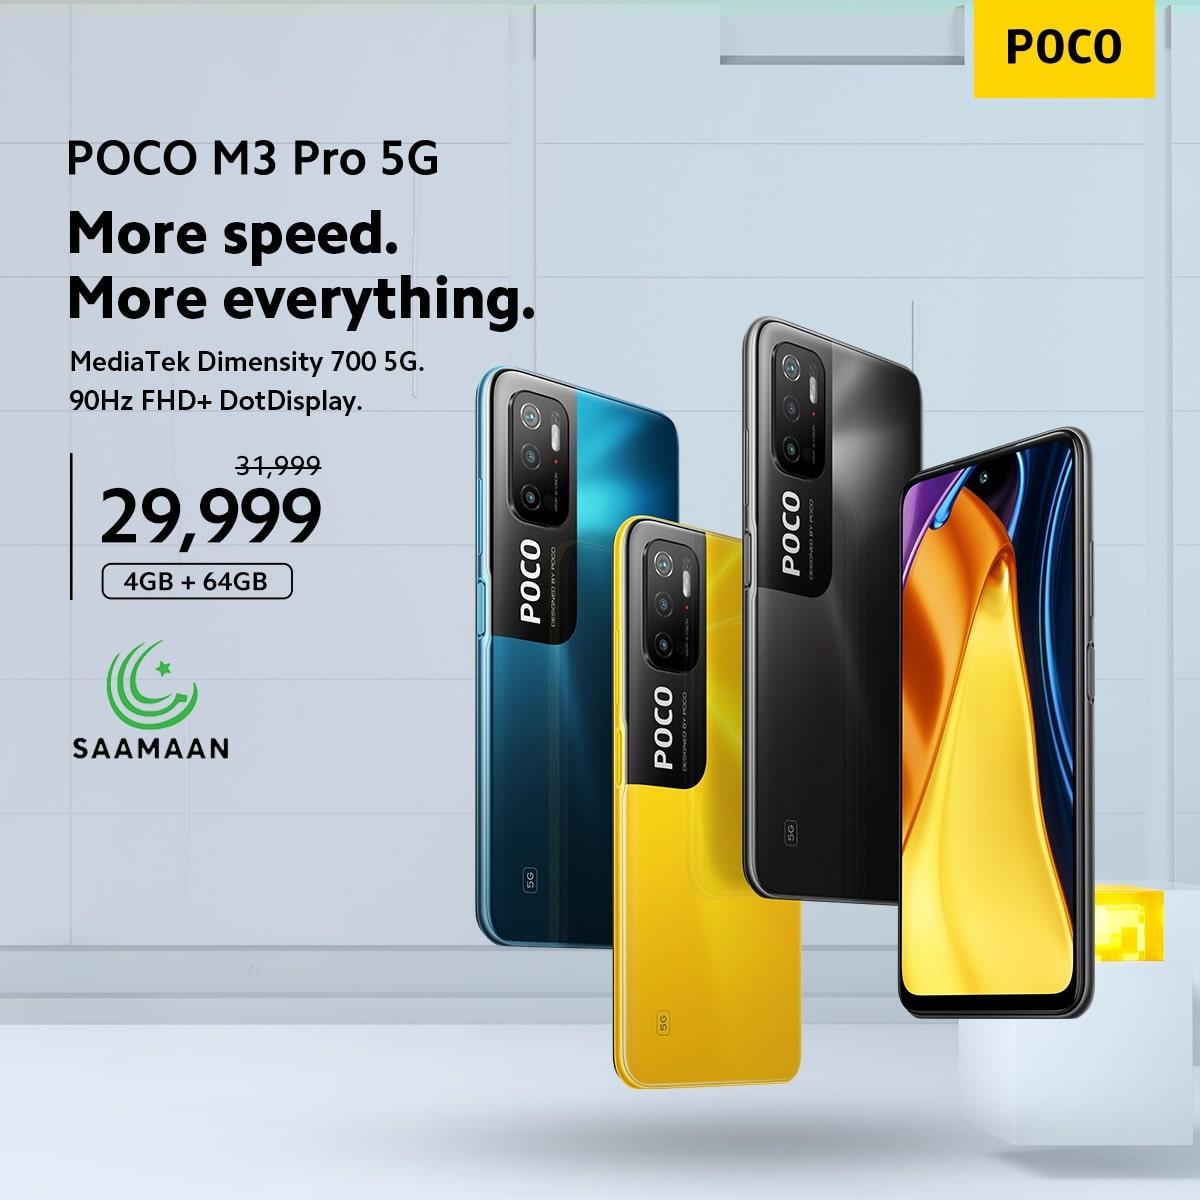 POCO-M3-Pro 5g 2-min